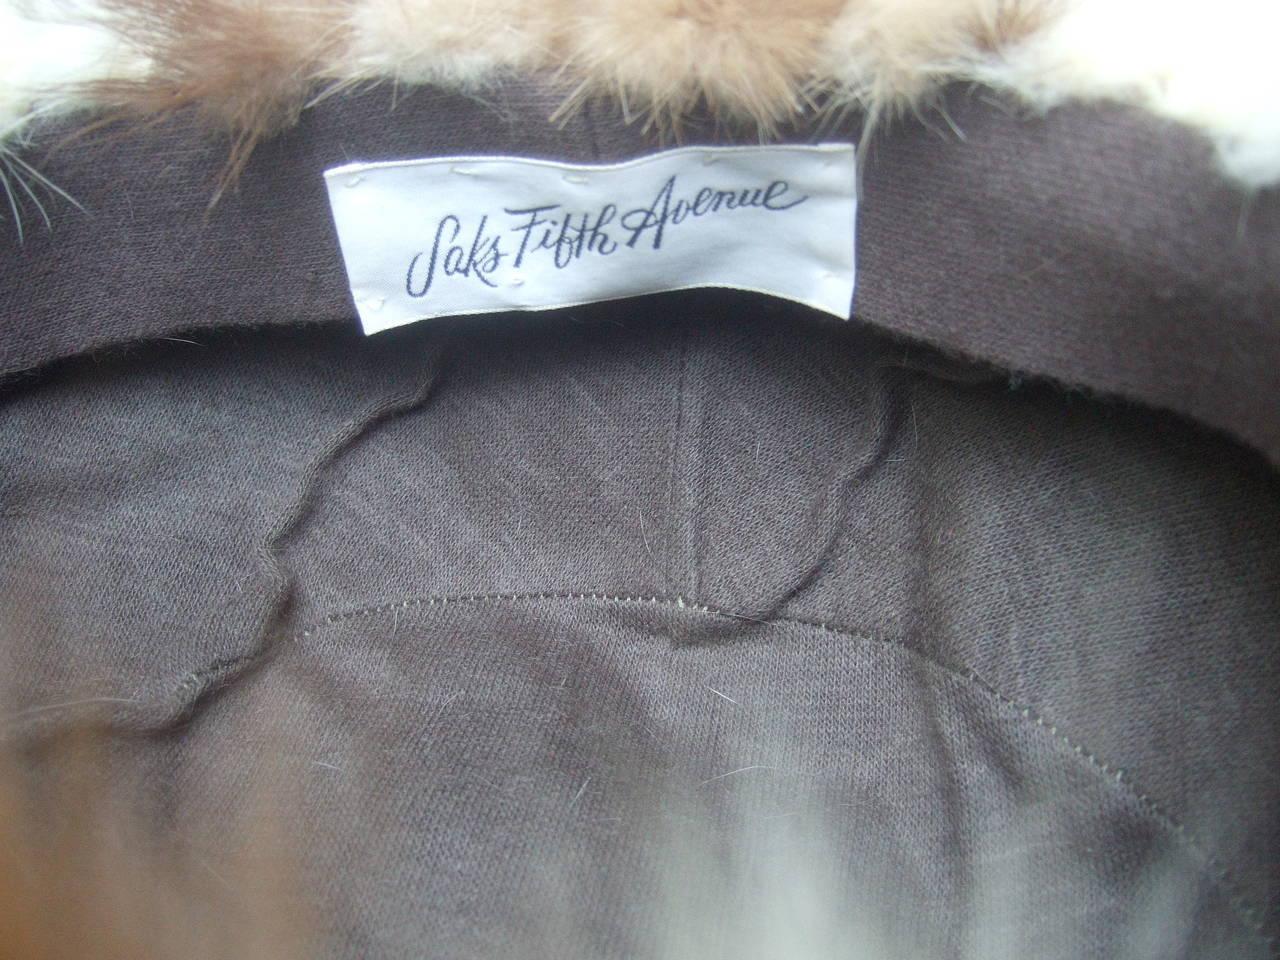 Saks Fifth Avenue Mink Patch Tile Hat c 1970 For Sale 4